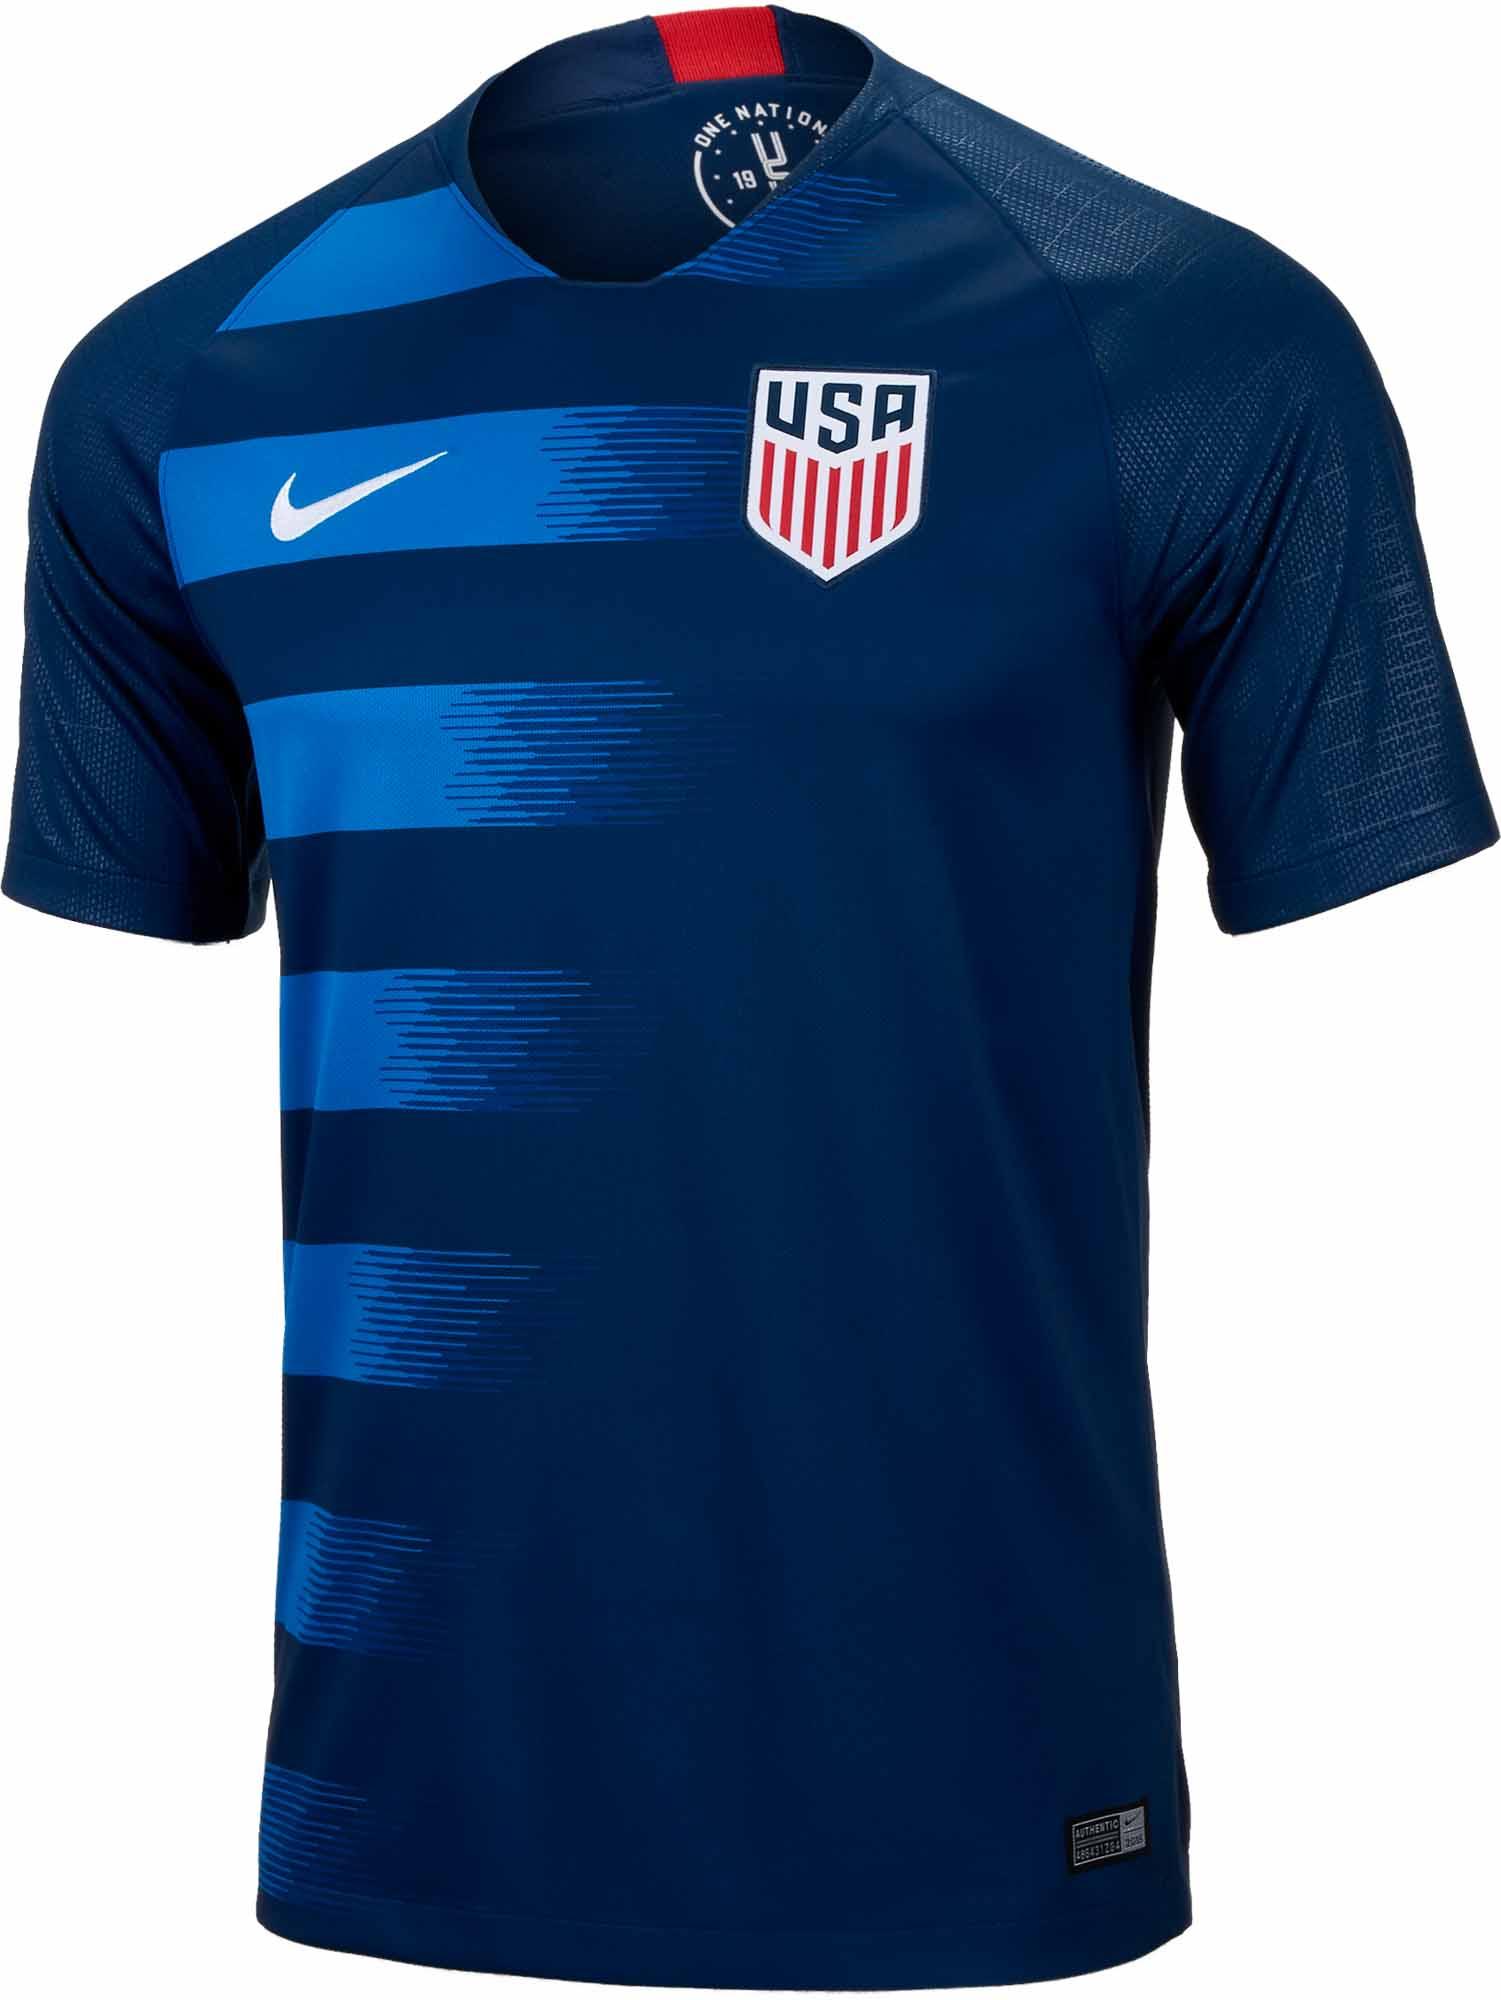 Nike USA Away Jersey 2018-19 - from SoccerPro.com